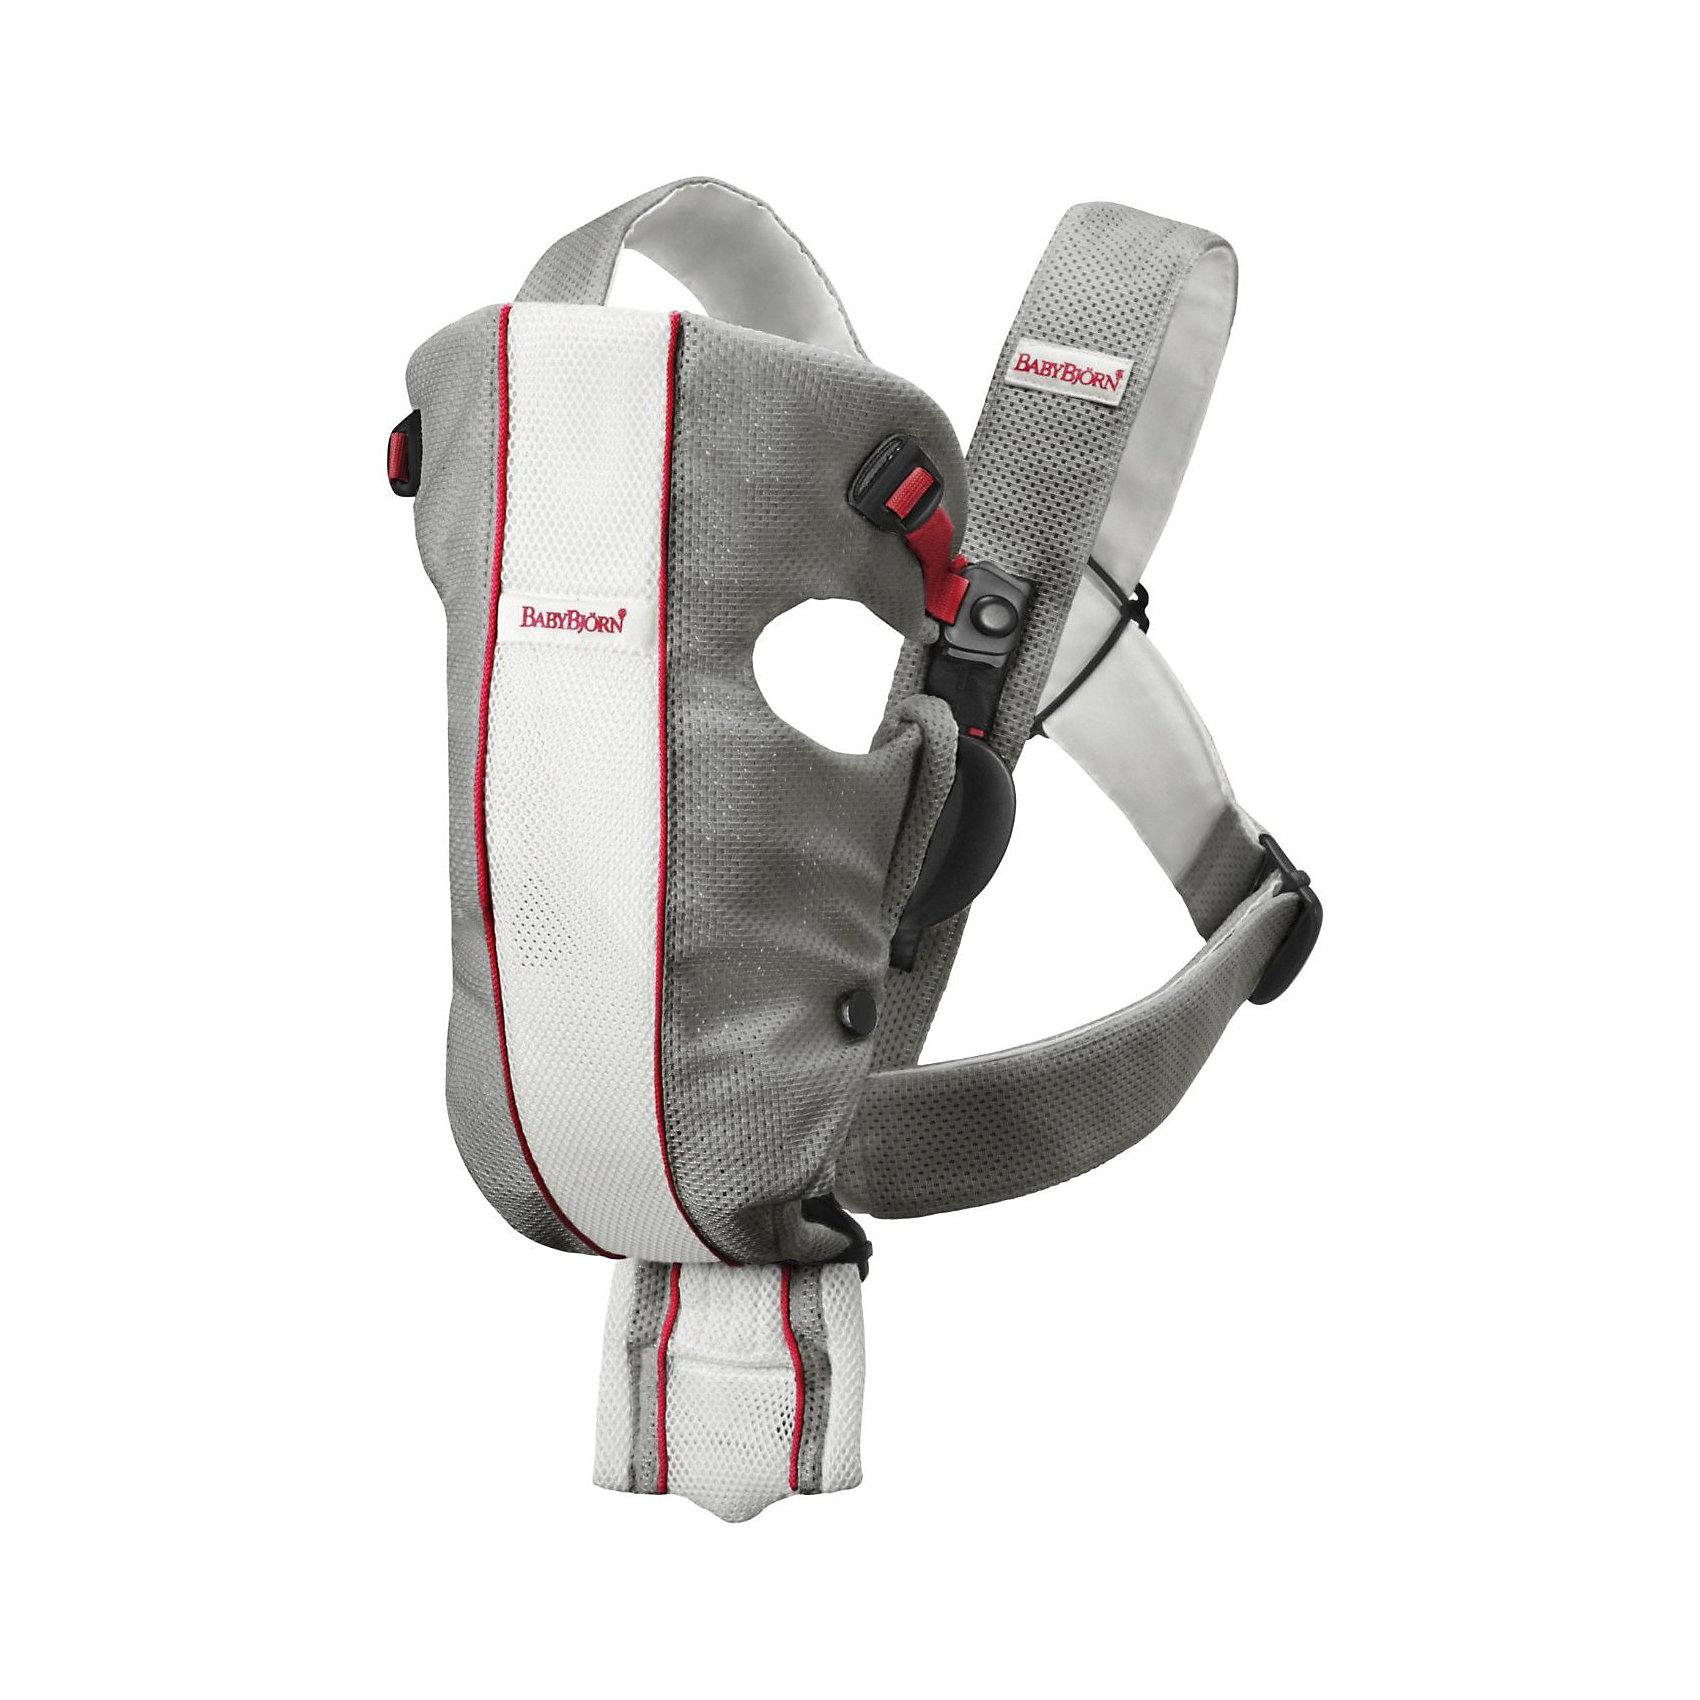 BabyBjorn Рюкзак-кенгуру Original, BabyBjorn, серый с белым рюкзак кенгуру babybjorn miracle soft сotton цвет черный серый